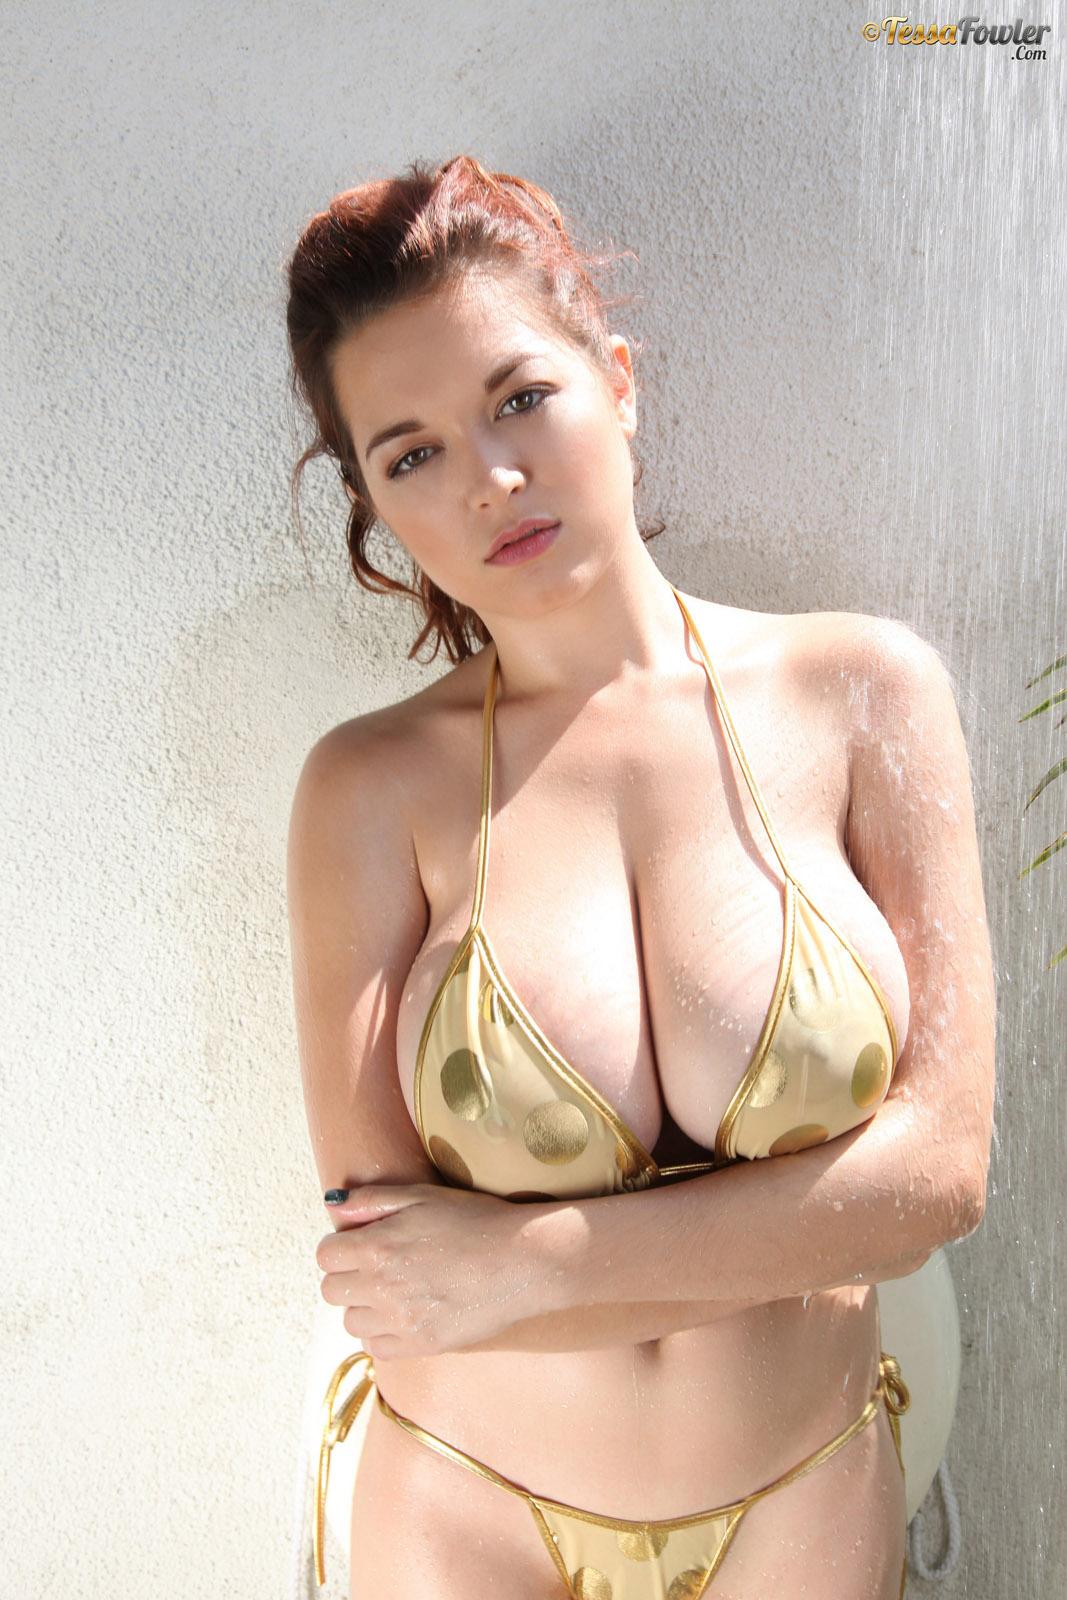 Tessa fowler bikini